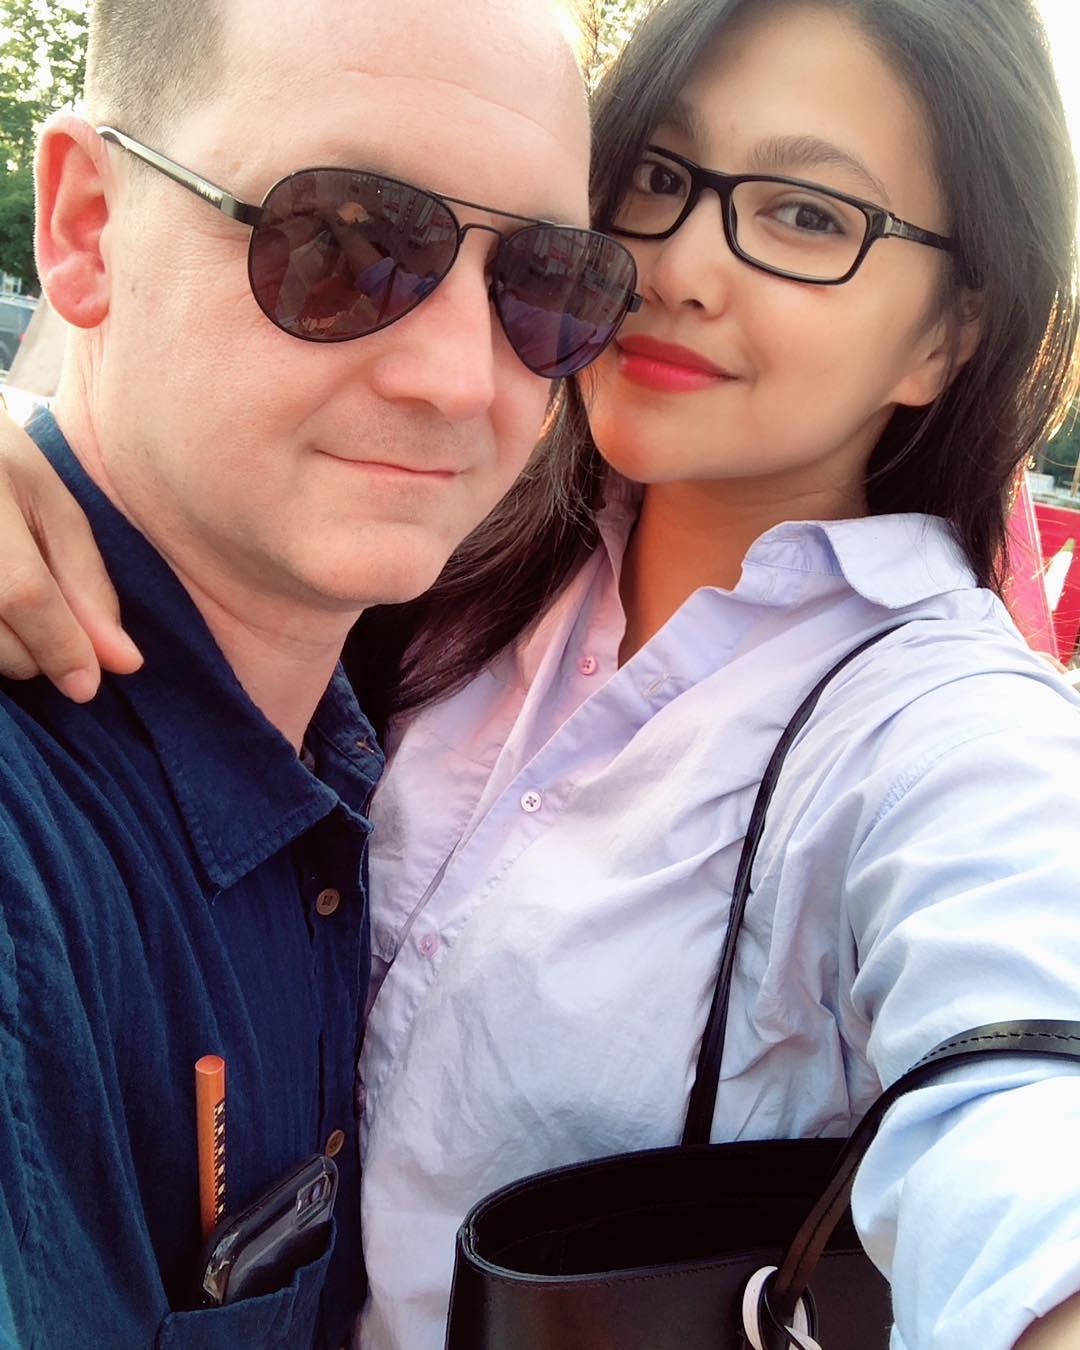 90 Day Fiance Leida Calls Alari Family After Reconciliation